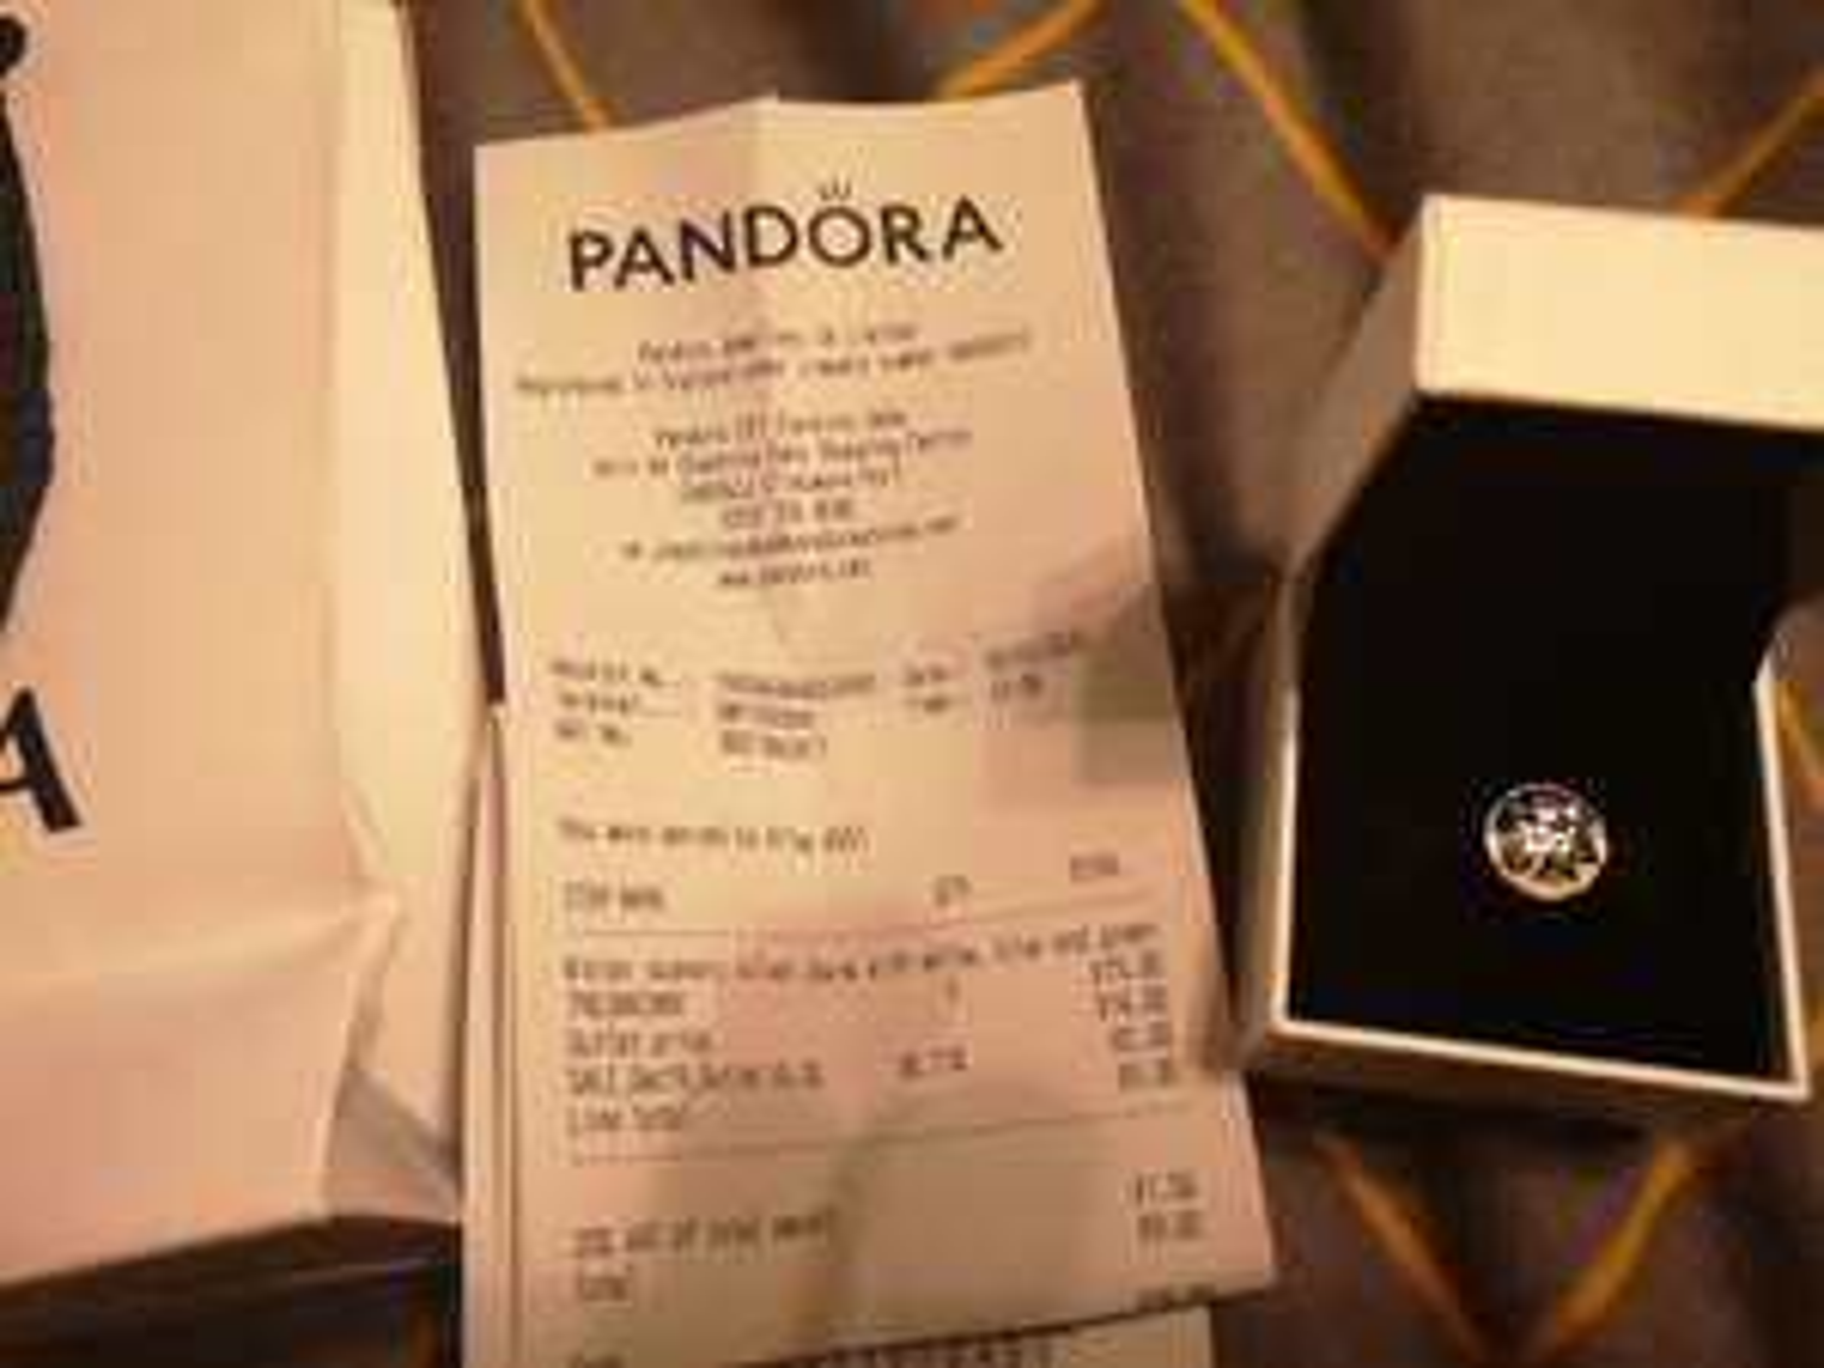 Pandora Winter Wonderland Charm, Cheshire Oaks Outlet Shop - £9